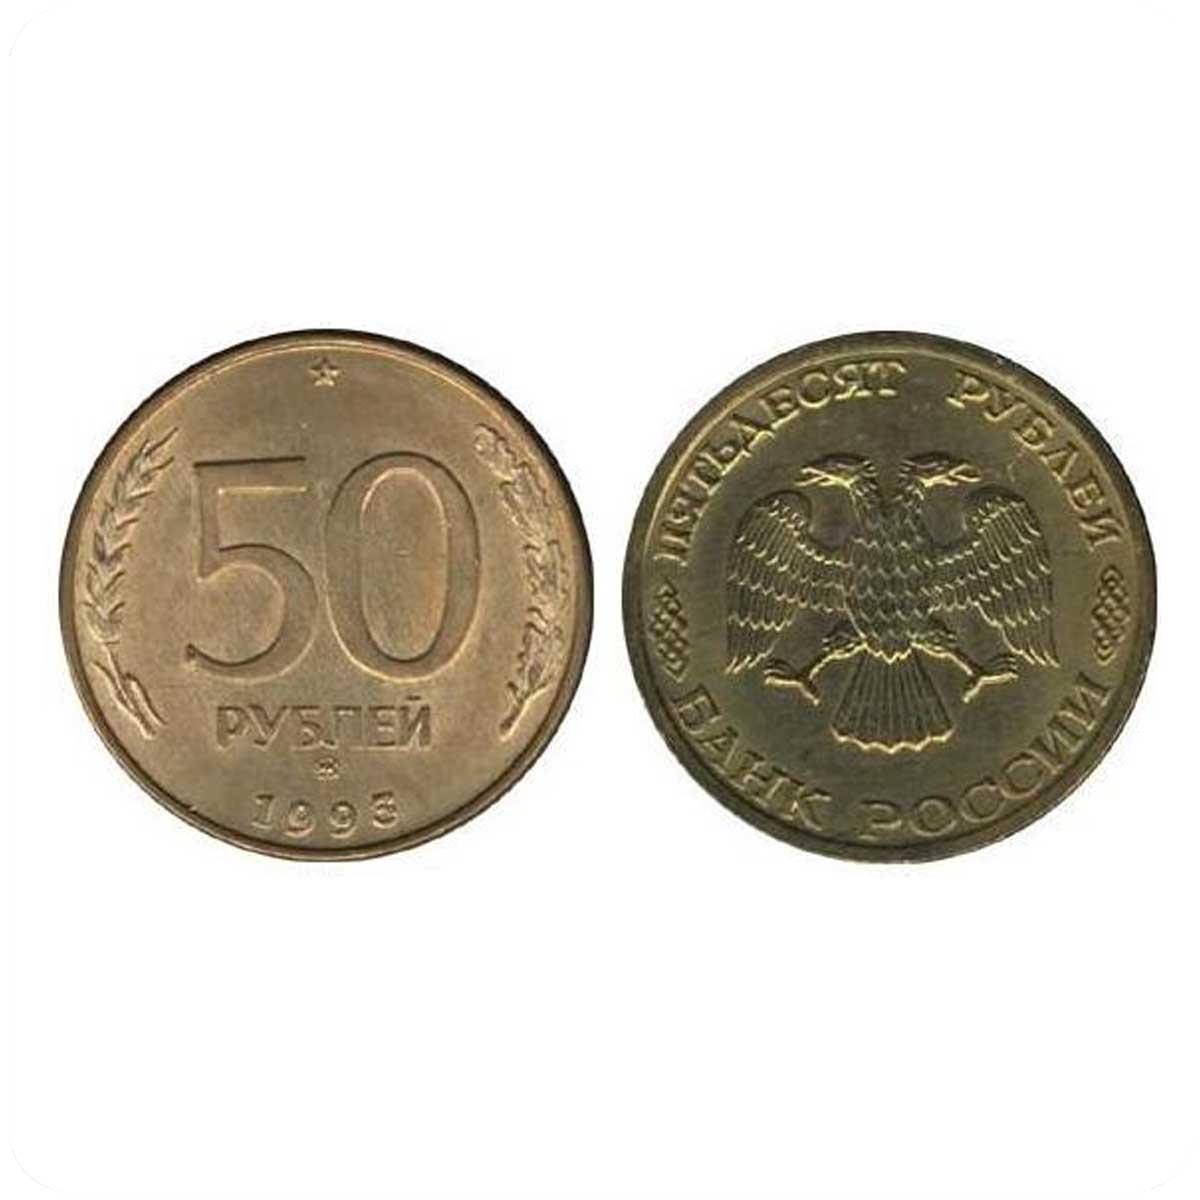 50 рублей 1993 ММД магнитная